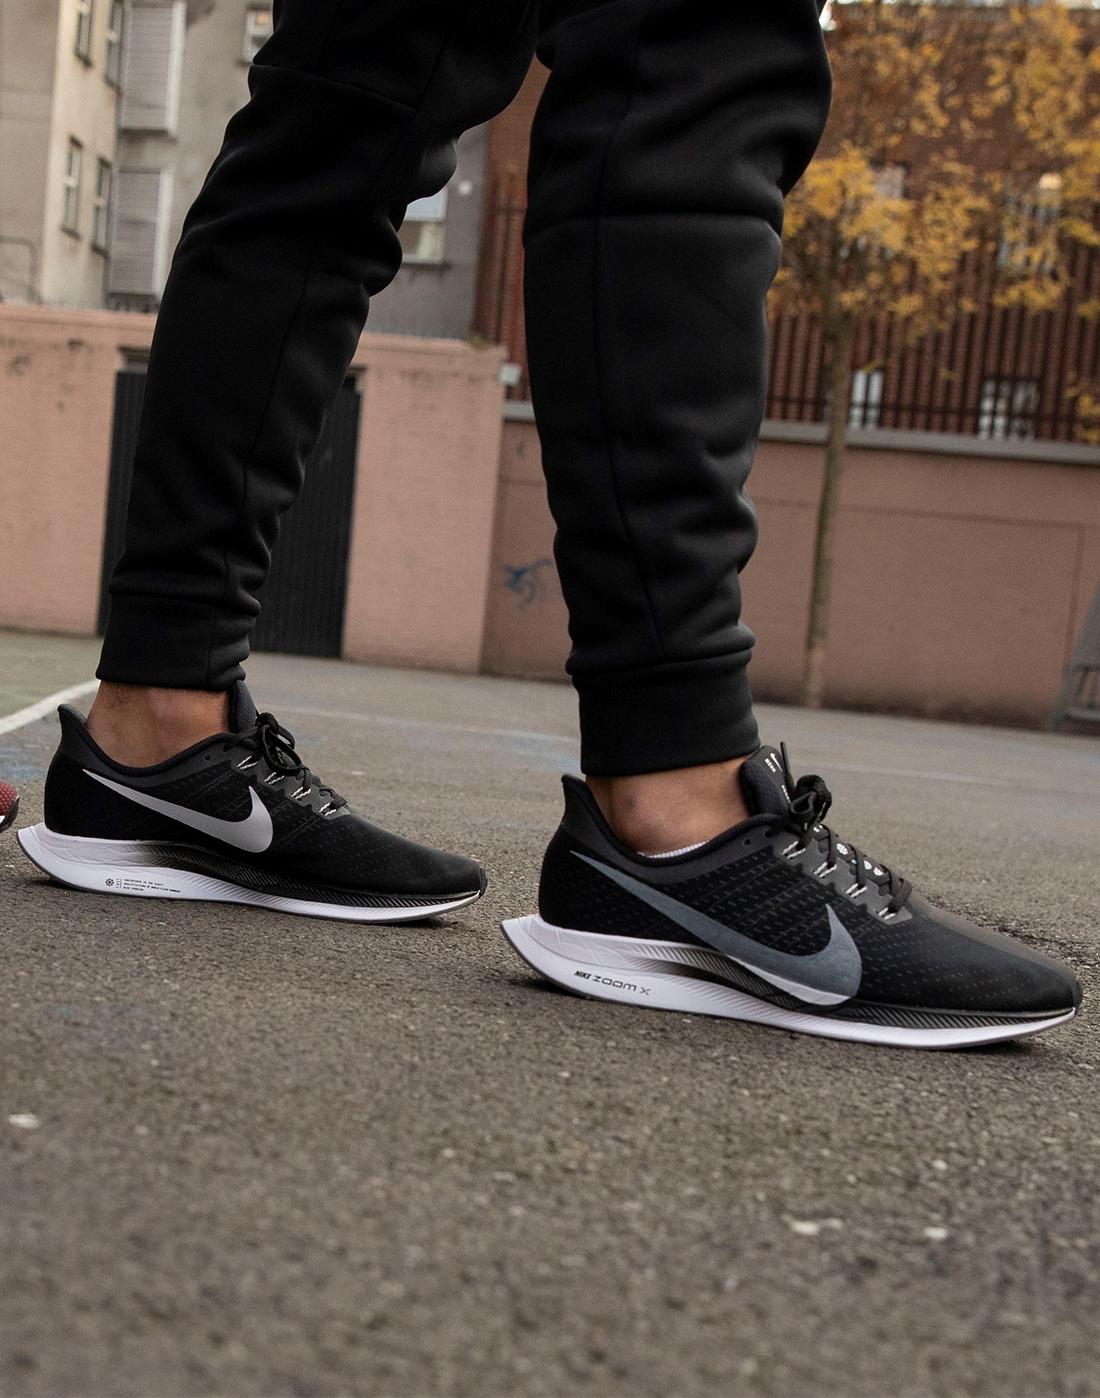 official photos 40025 66030 Men's Nike Pegasus 35 Turbo | Black | Life Style Sports